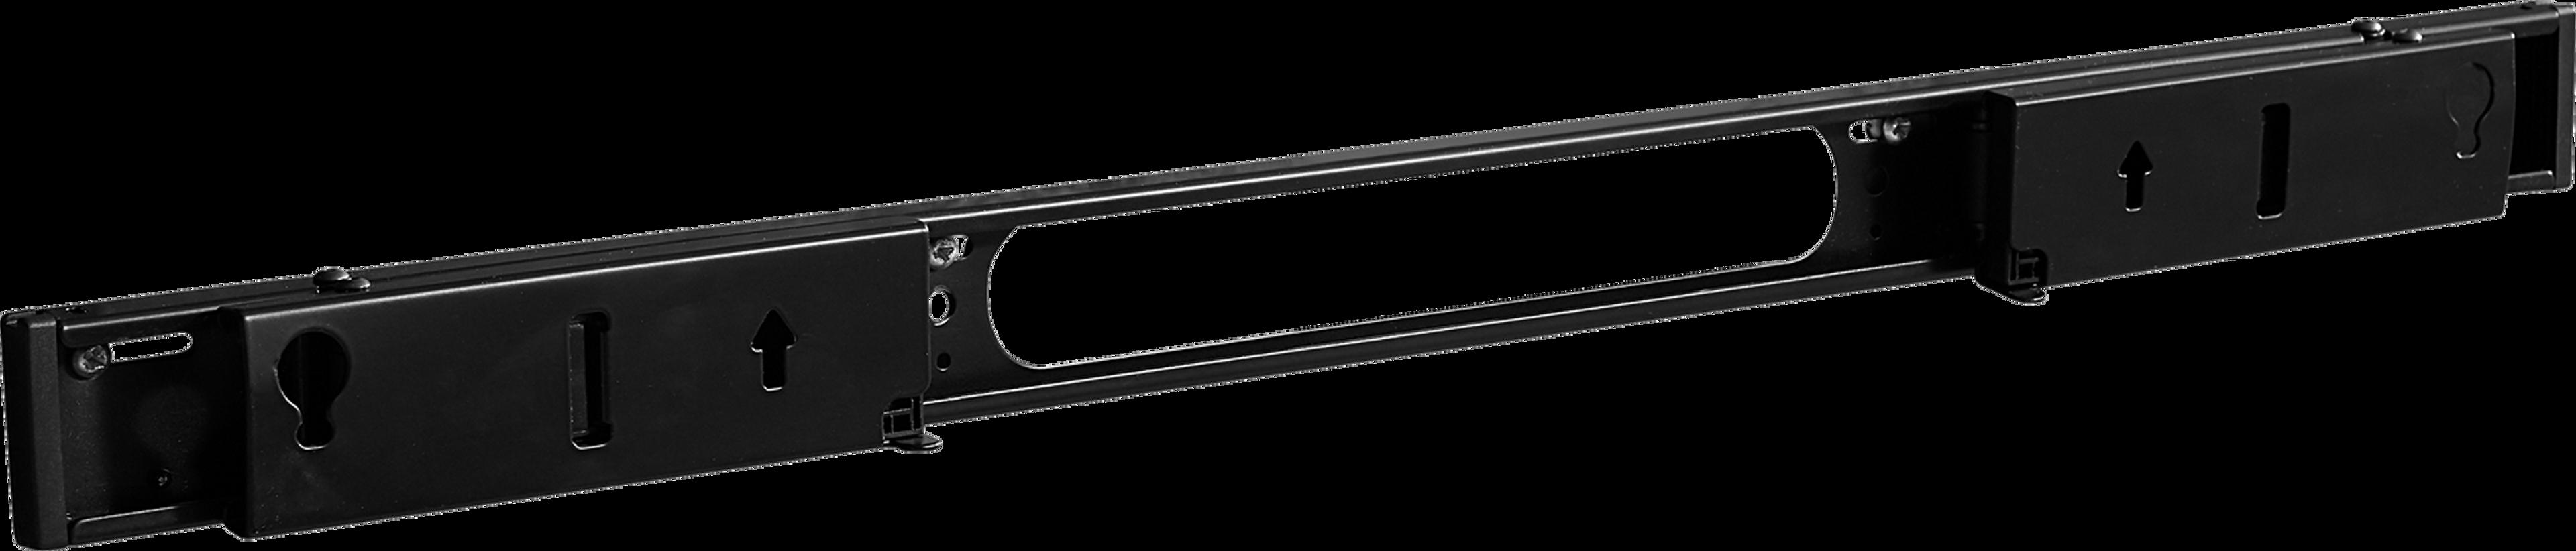 Sanus Wall Mount Arc angle black